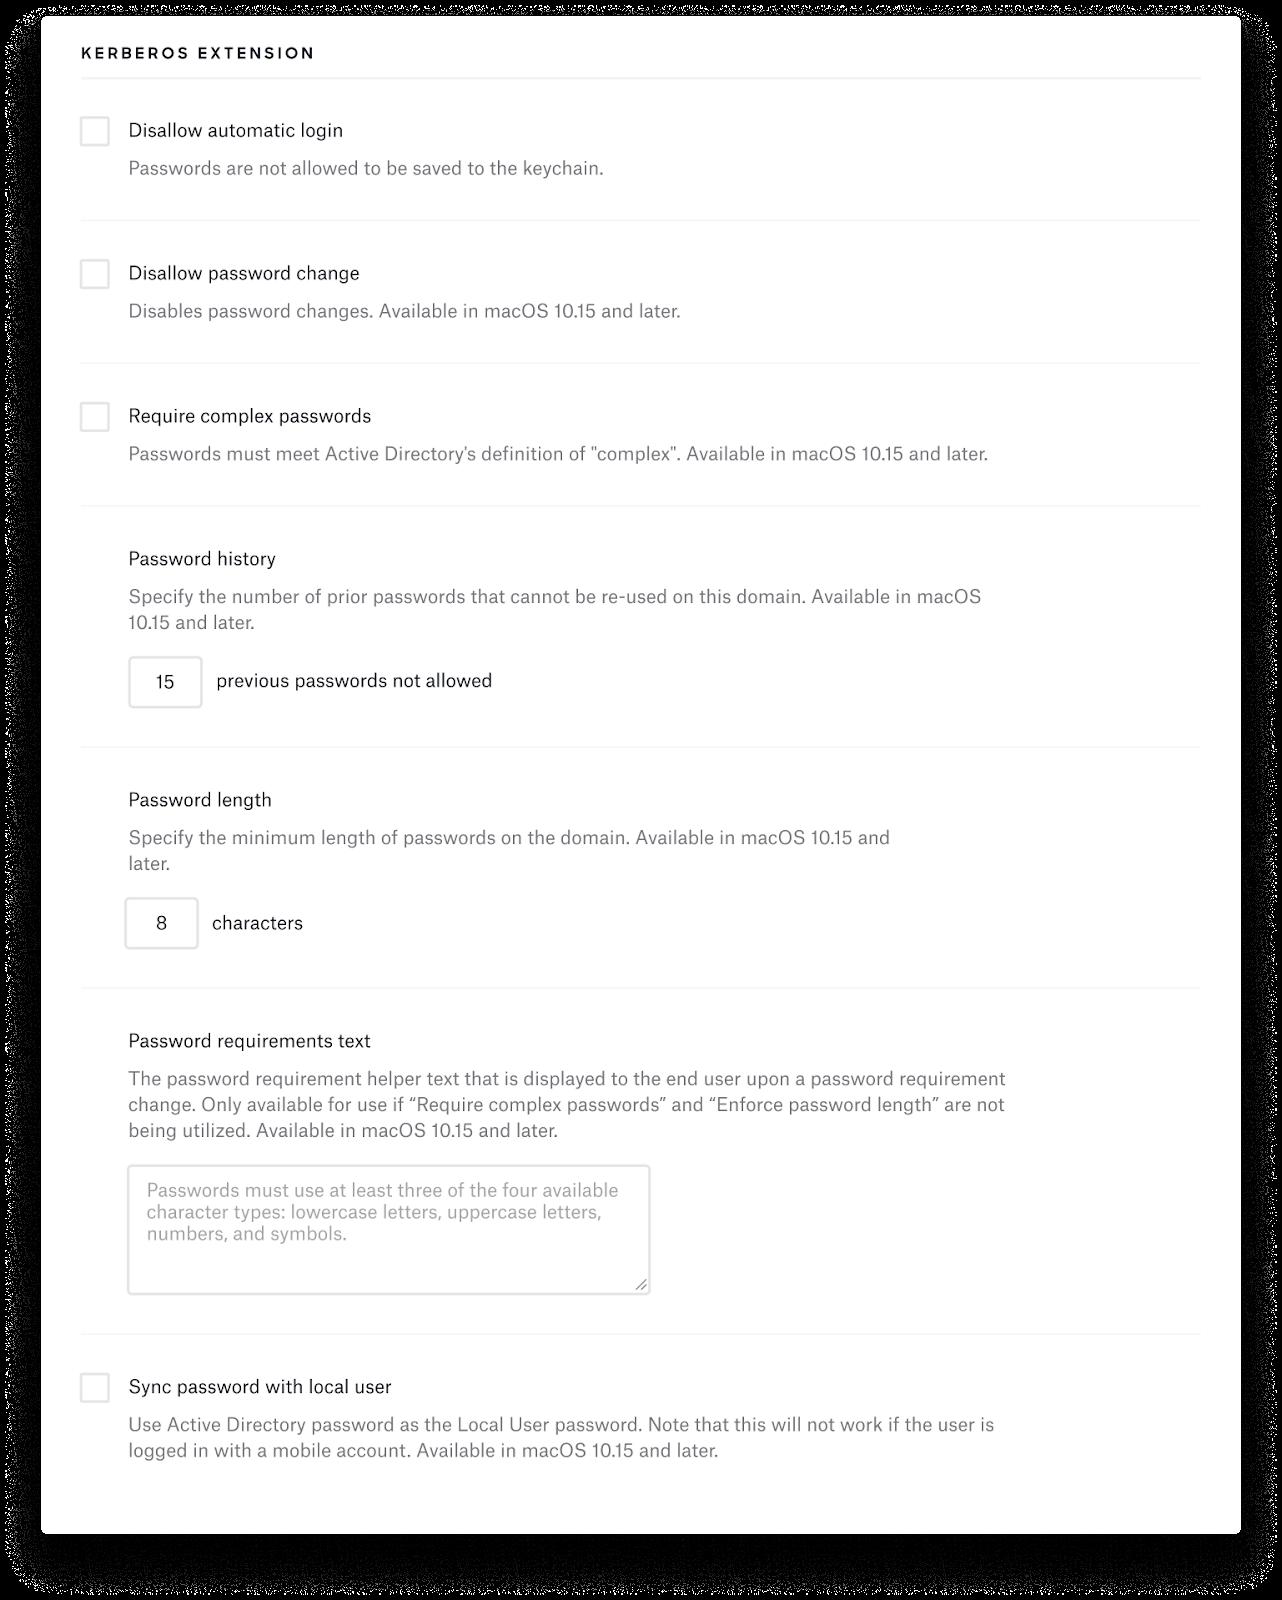 Kerberos SSO extension profile